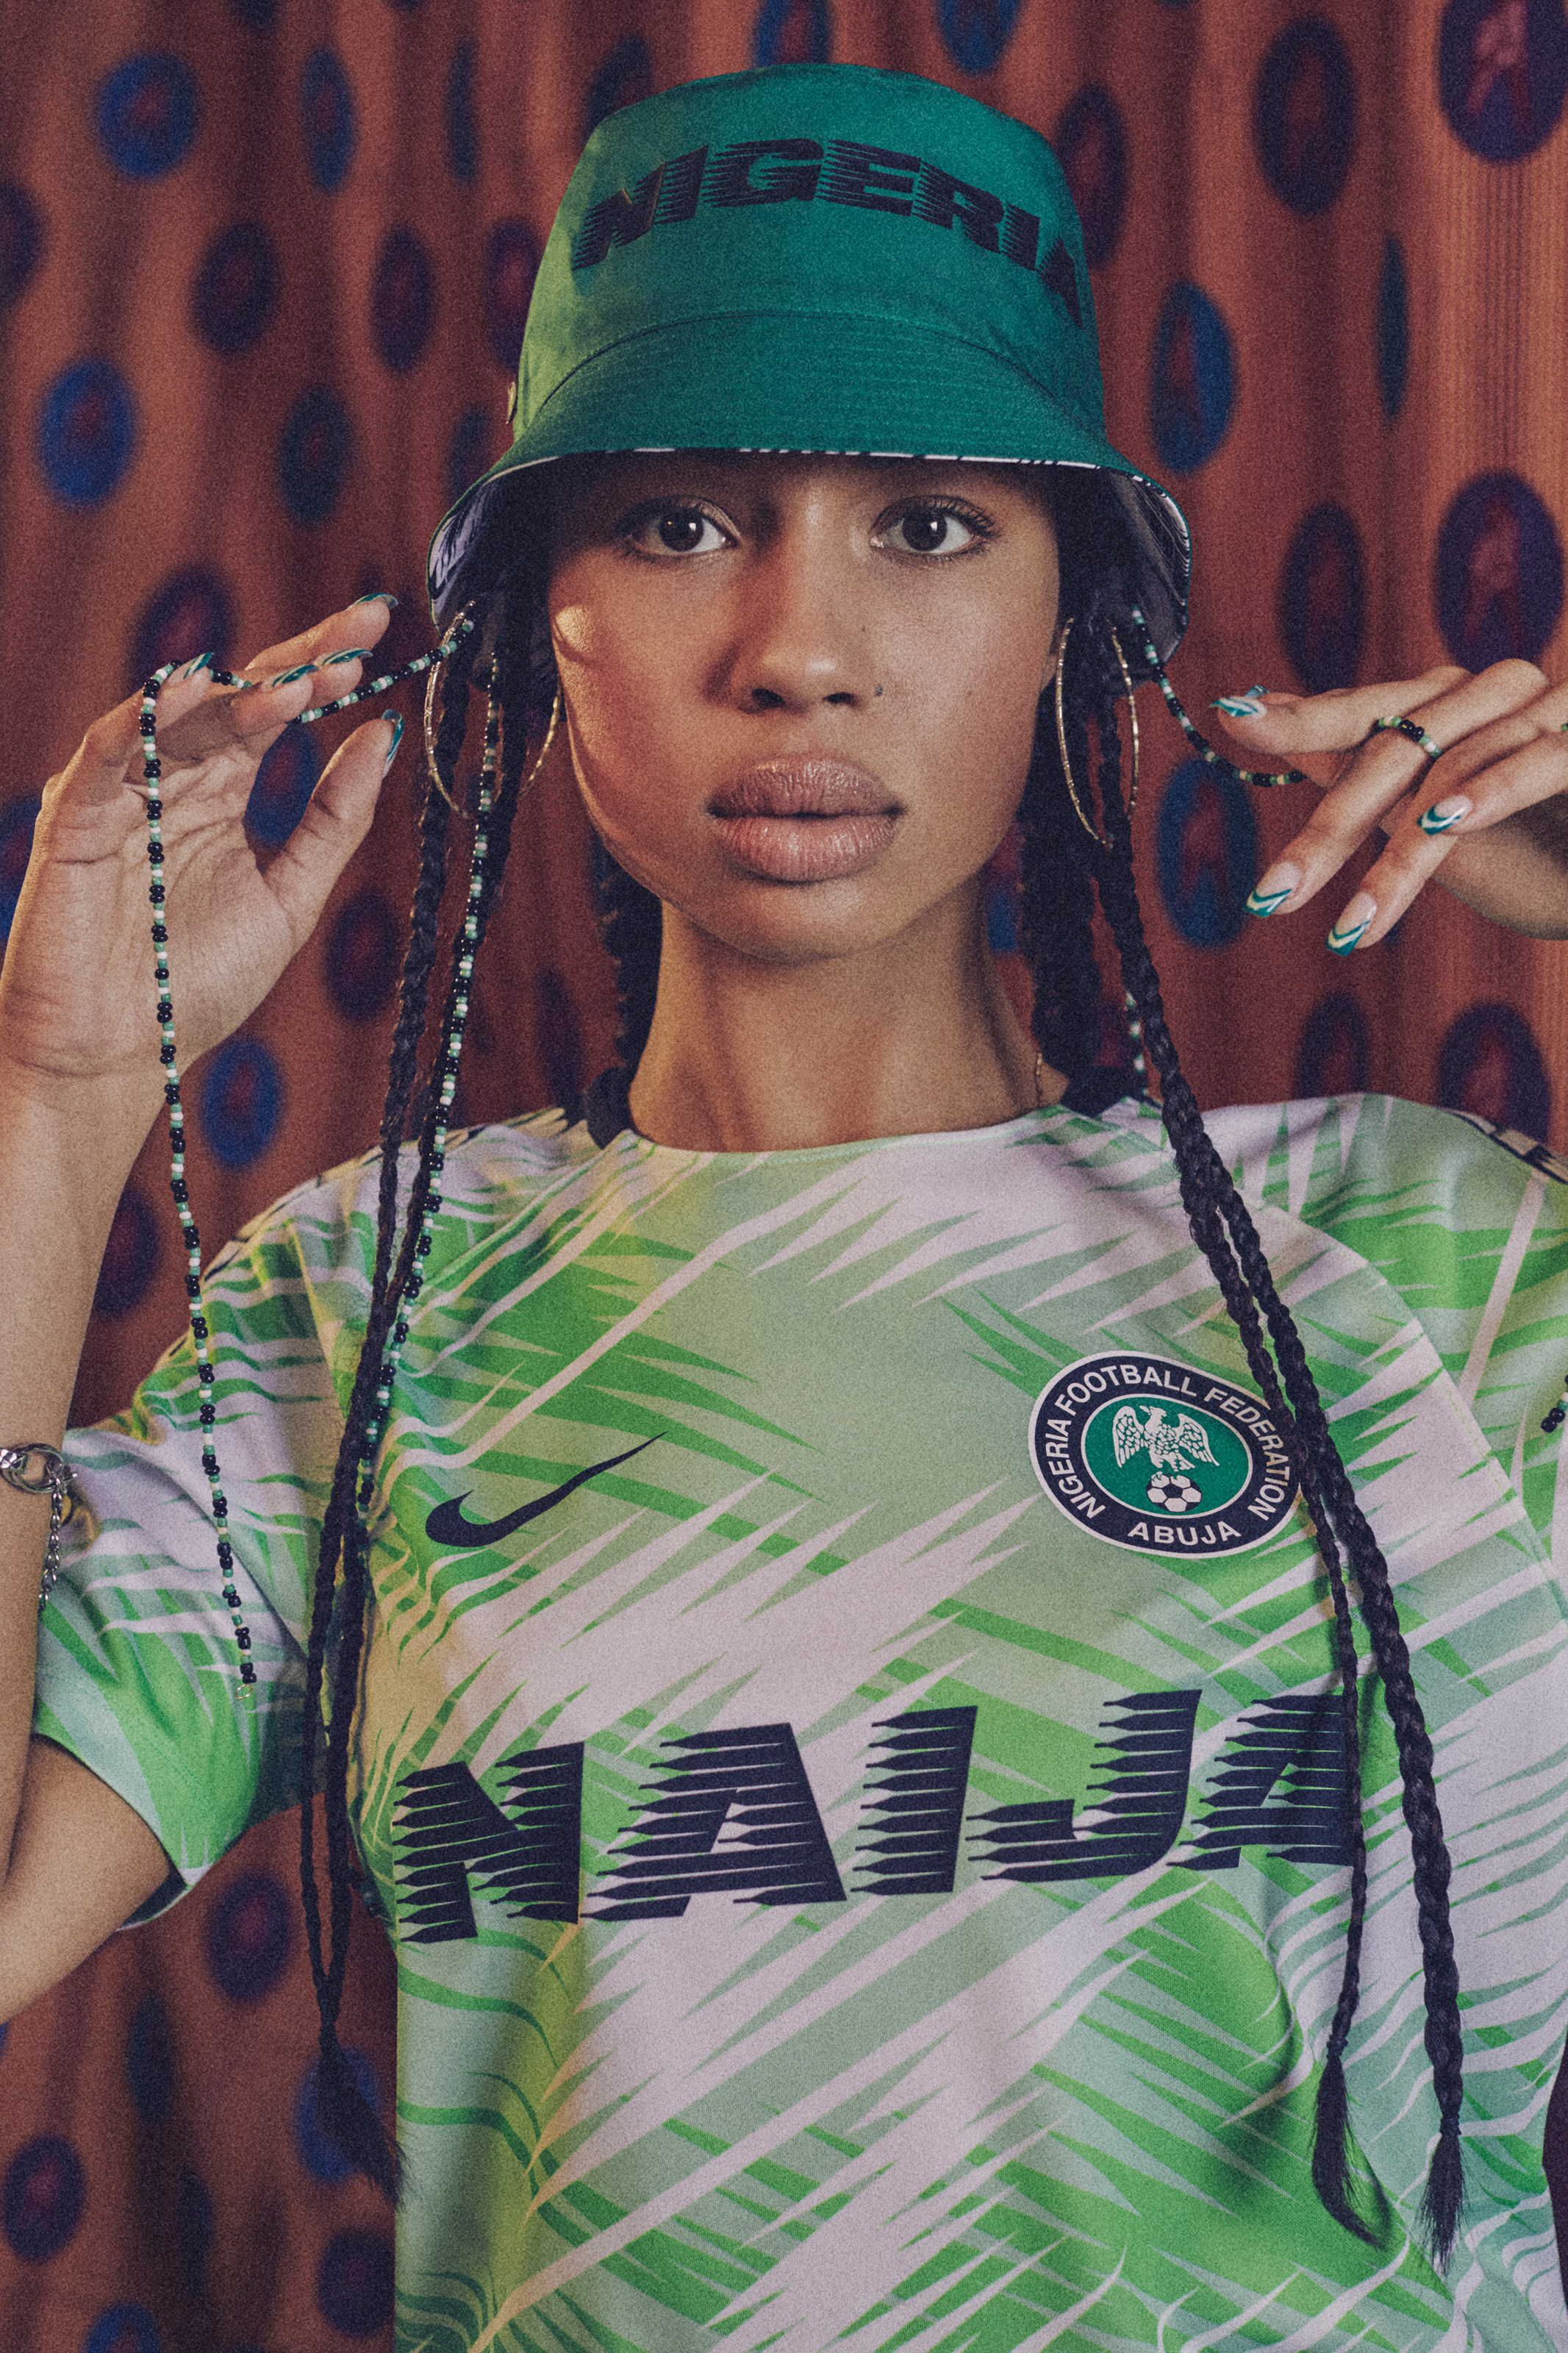 Nike-News-Football-Soccer-Nigeria-National-Team-Kit-11_original.JPG